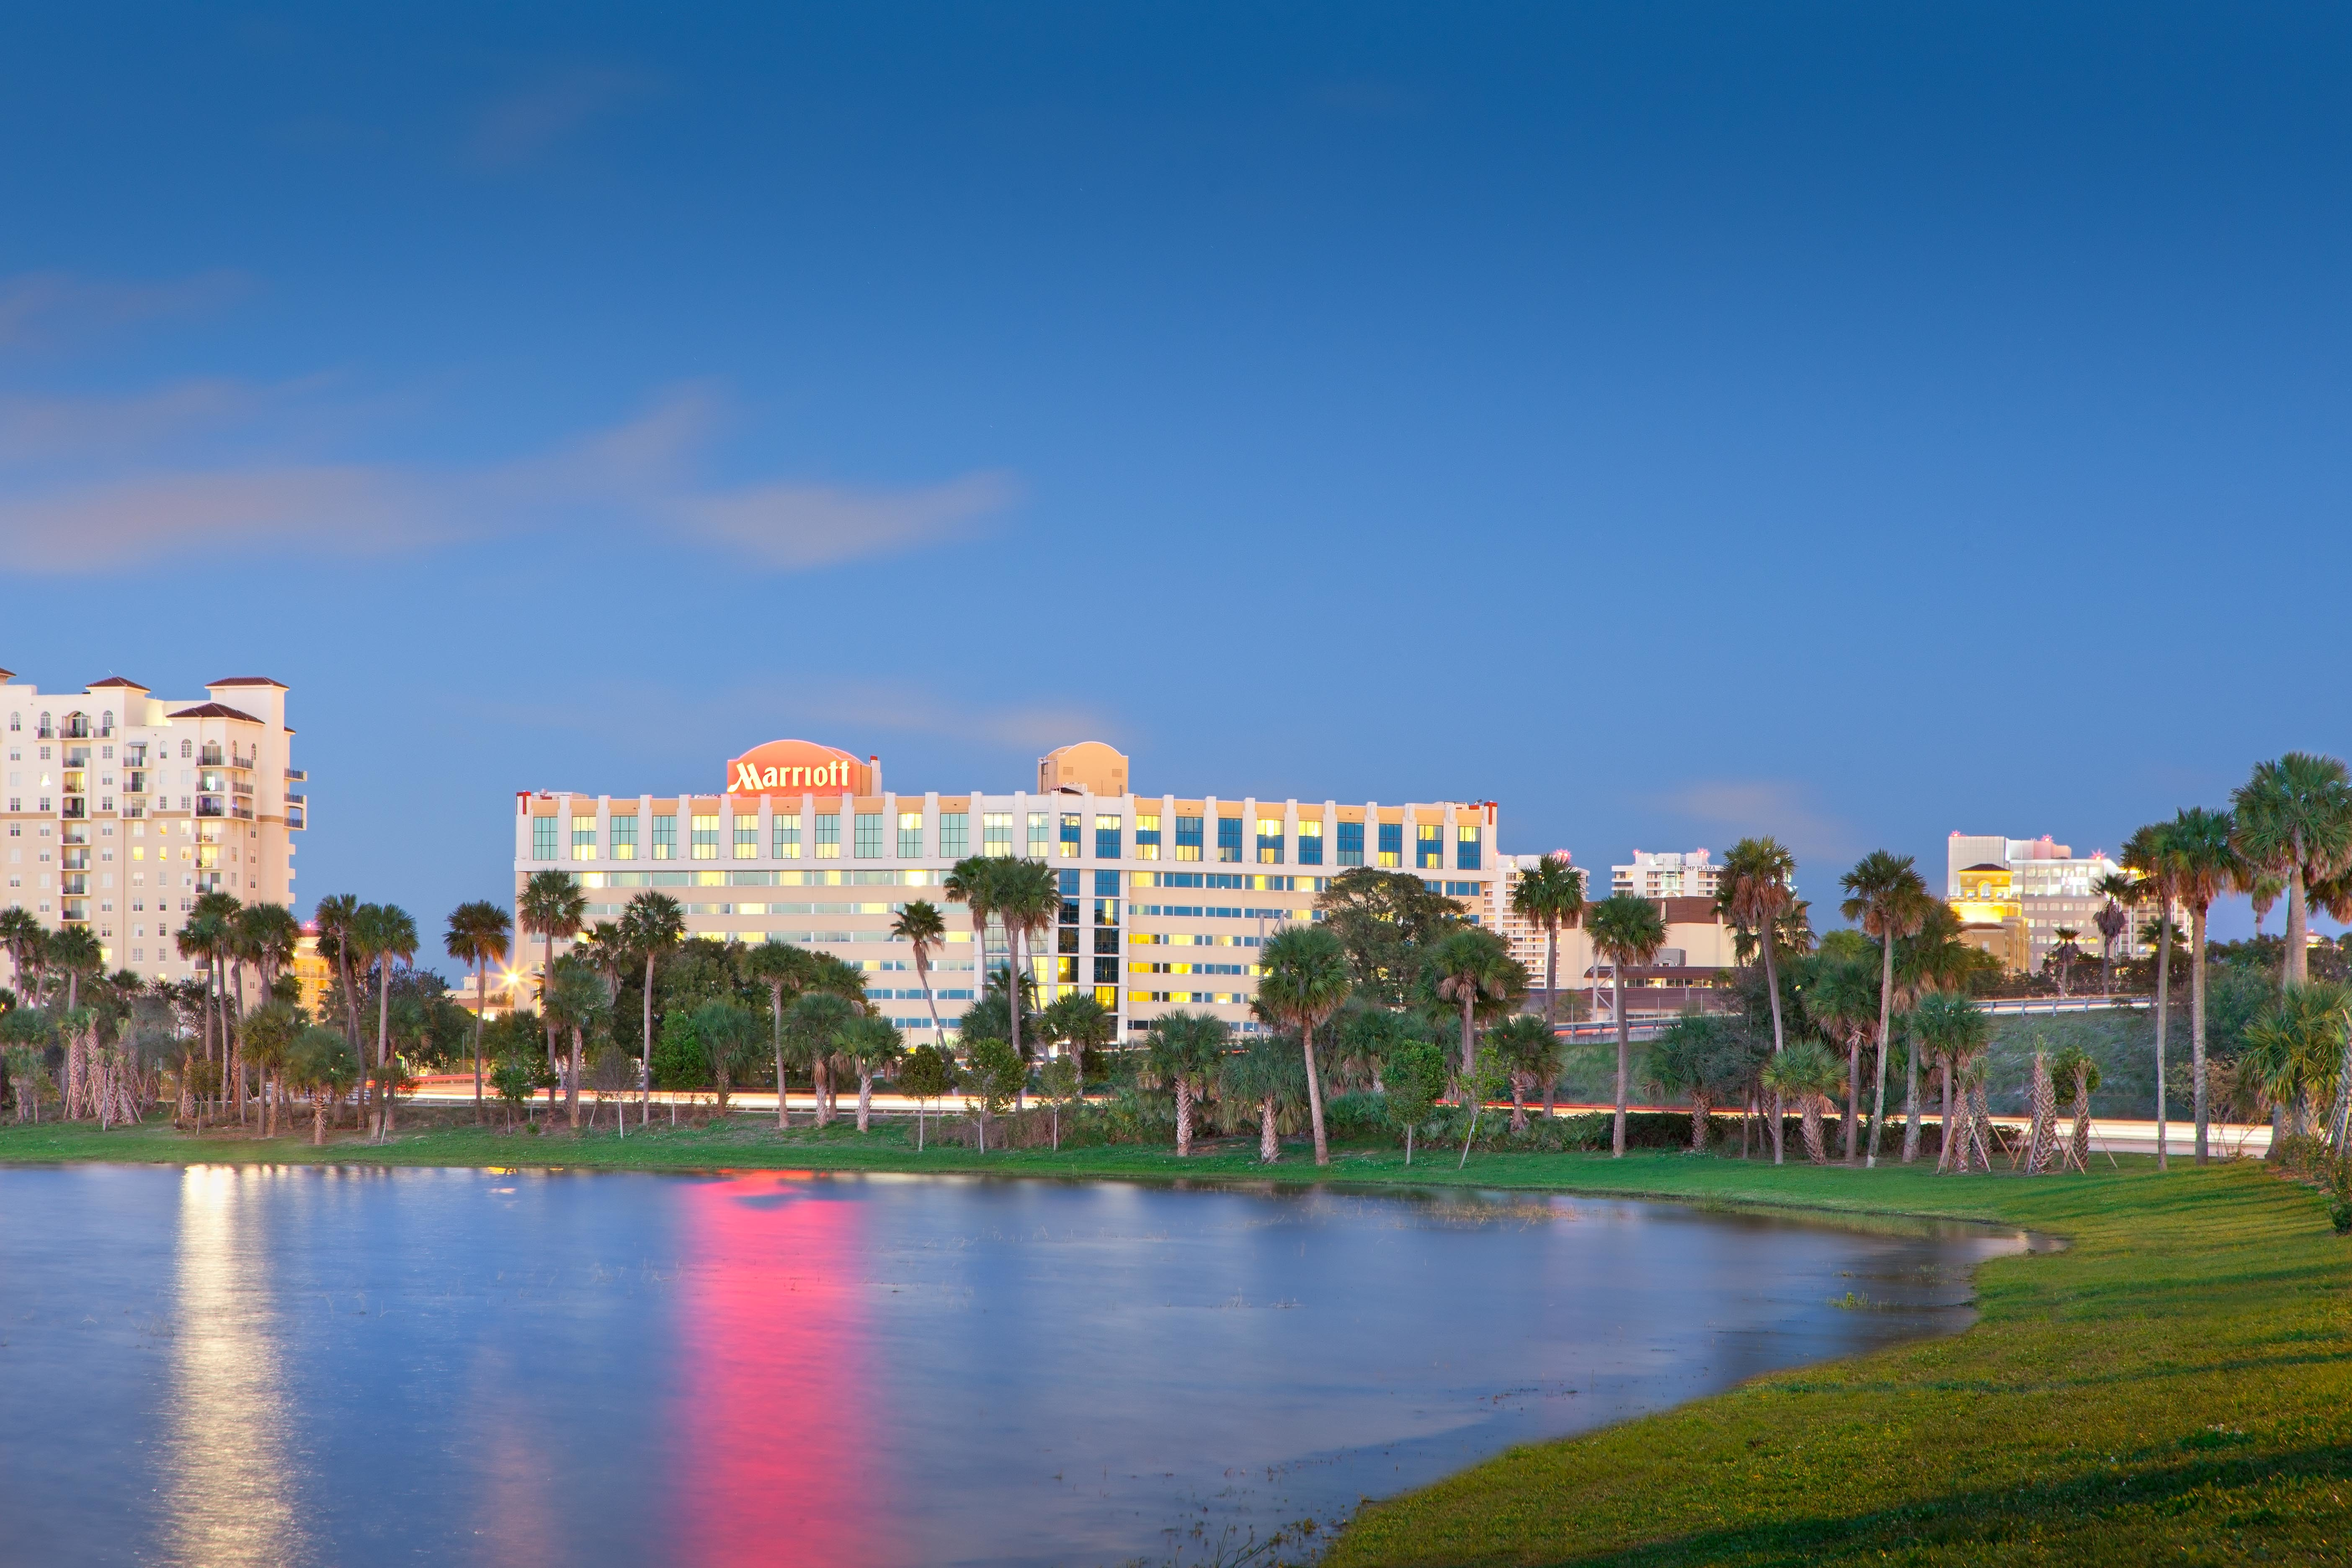 chicago massage parlour Palm Bay, Florida